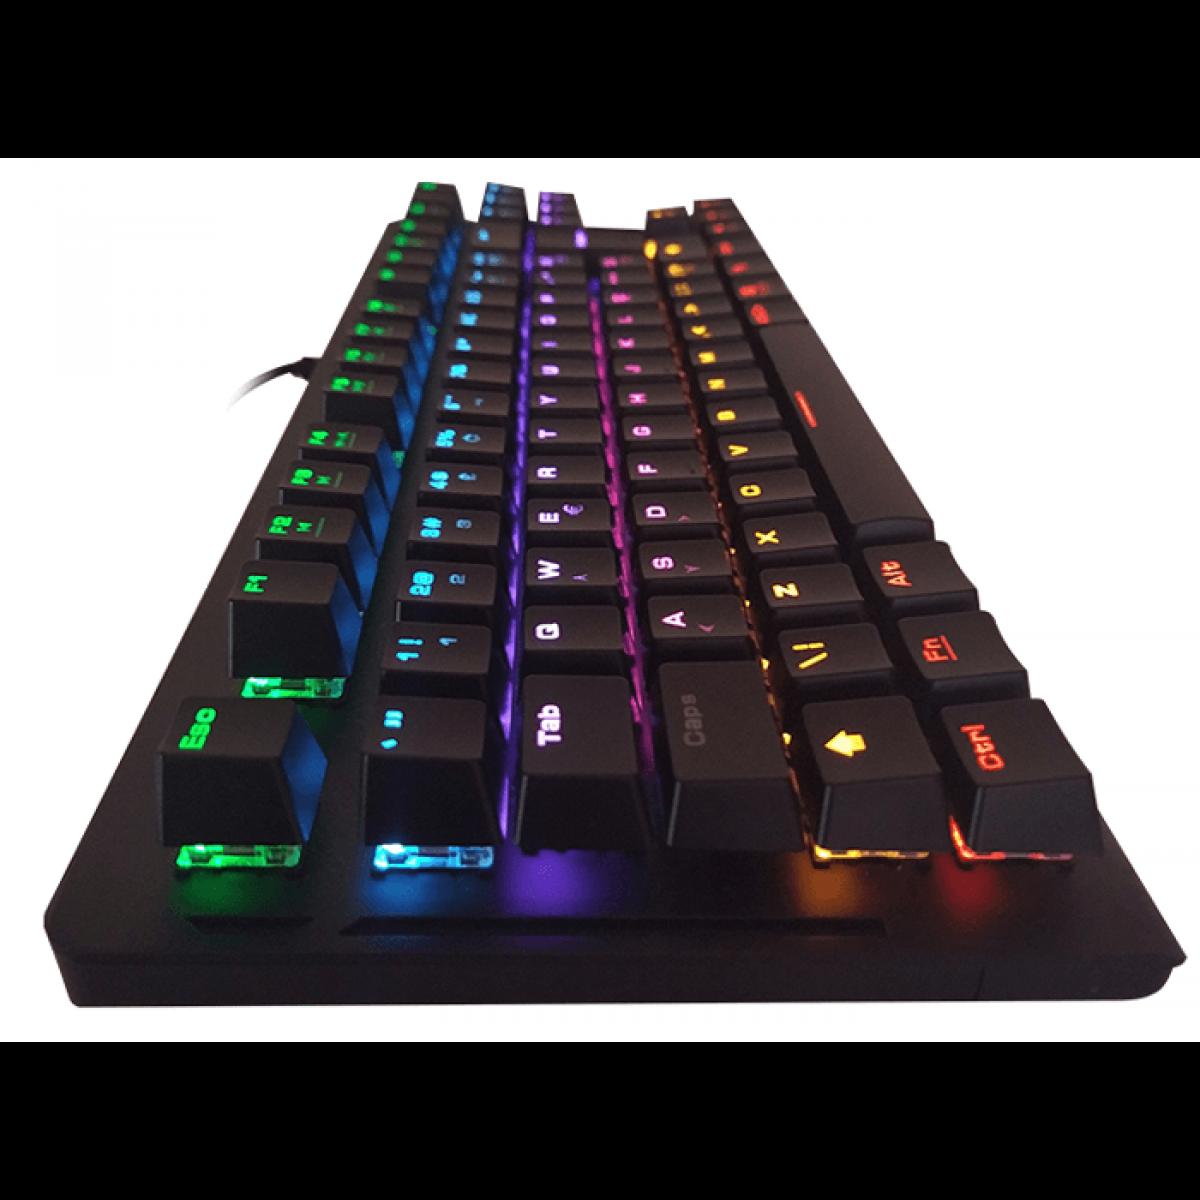 Teclado Mecânico Gamer Gamdias Hermes E2 Rainbow, Switch Blue, ABNT2